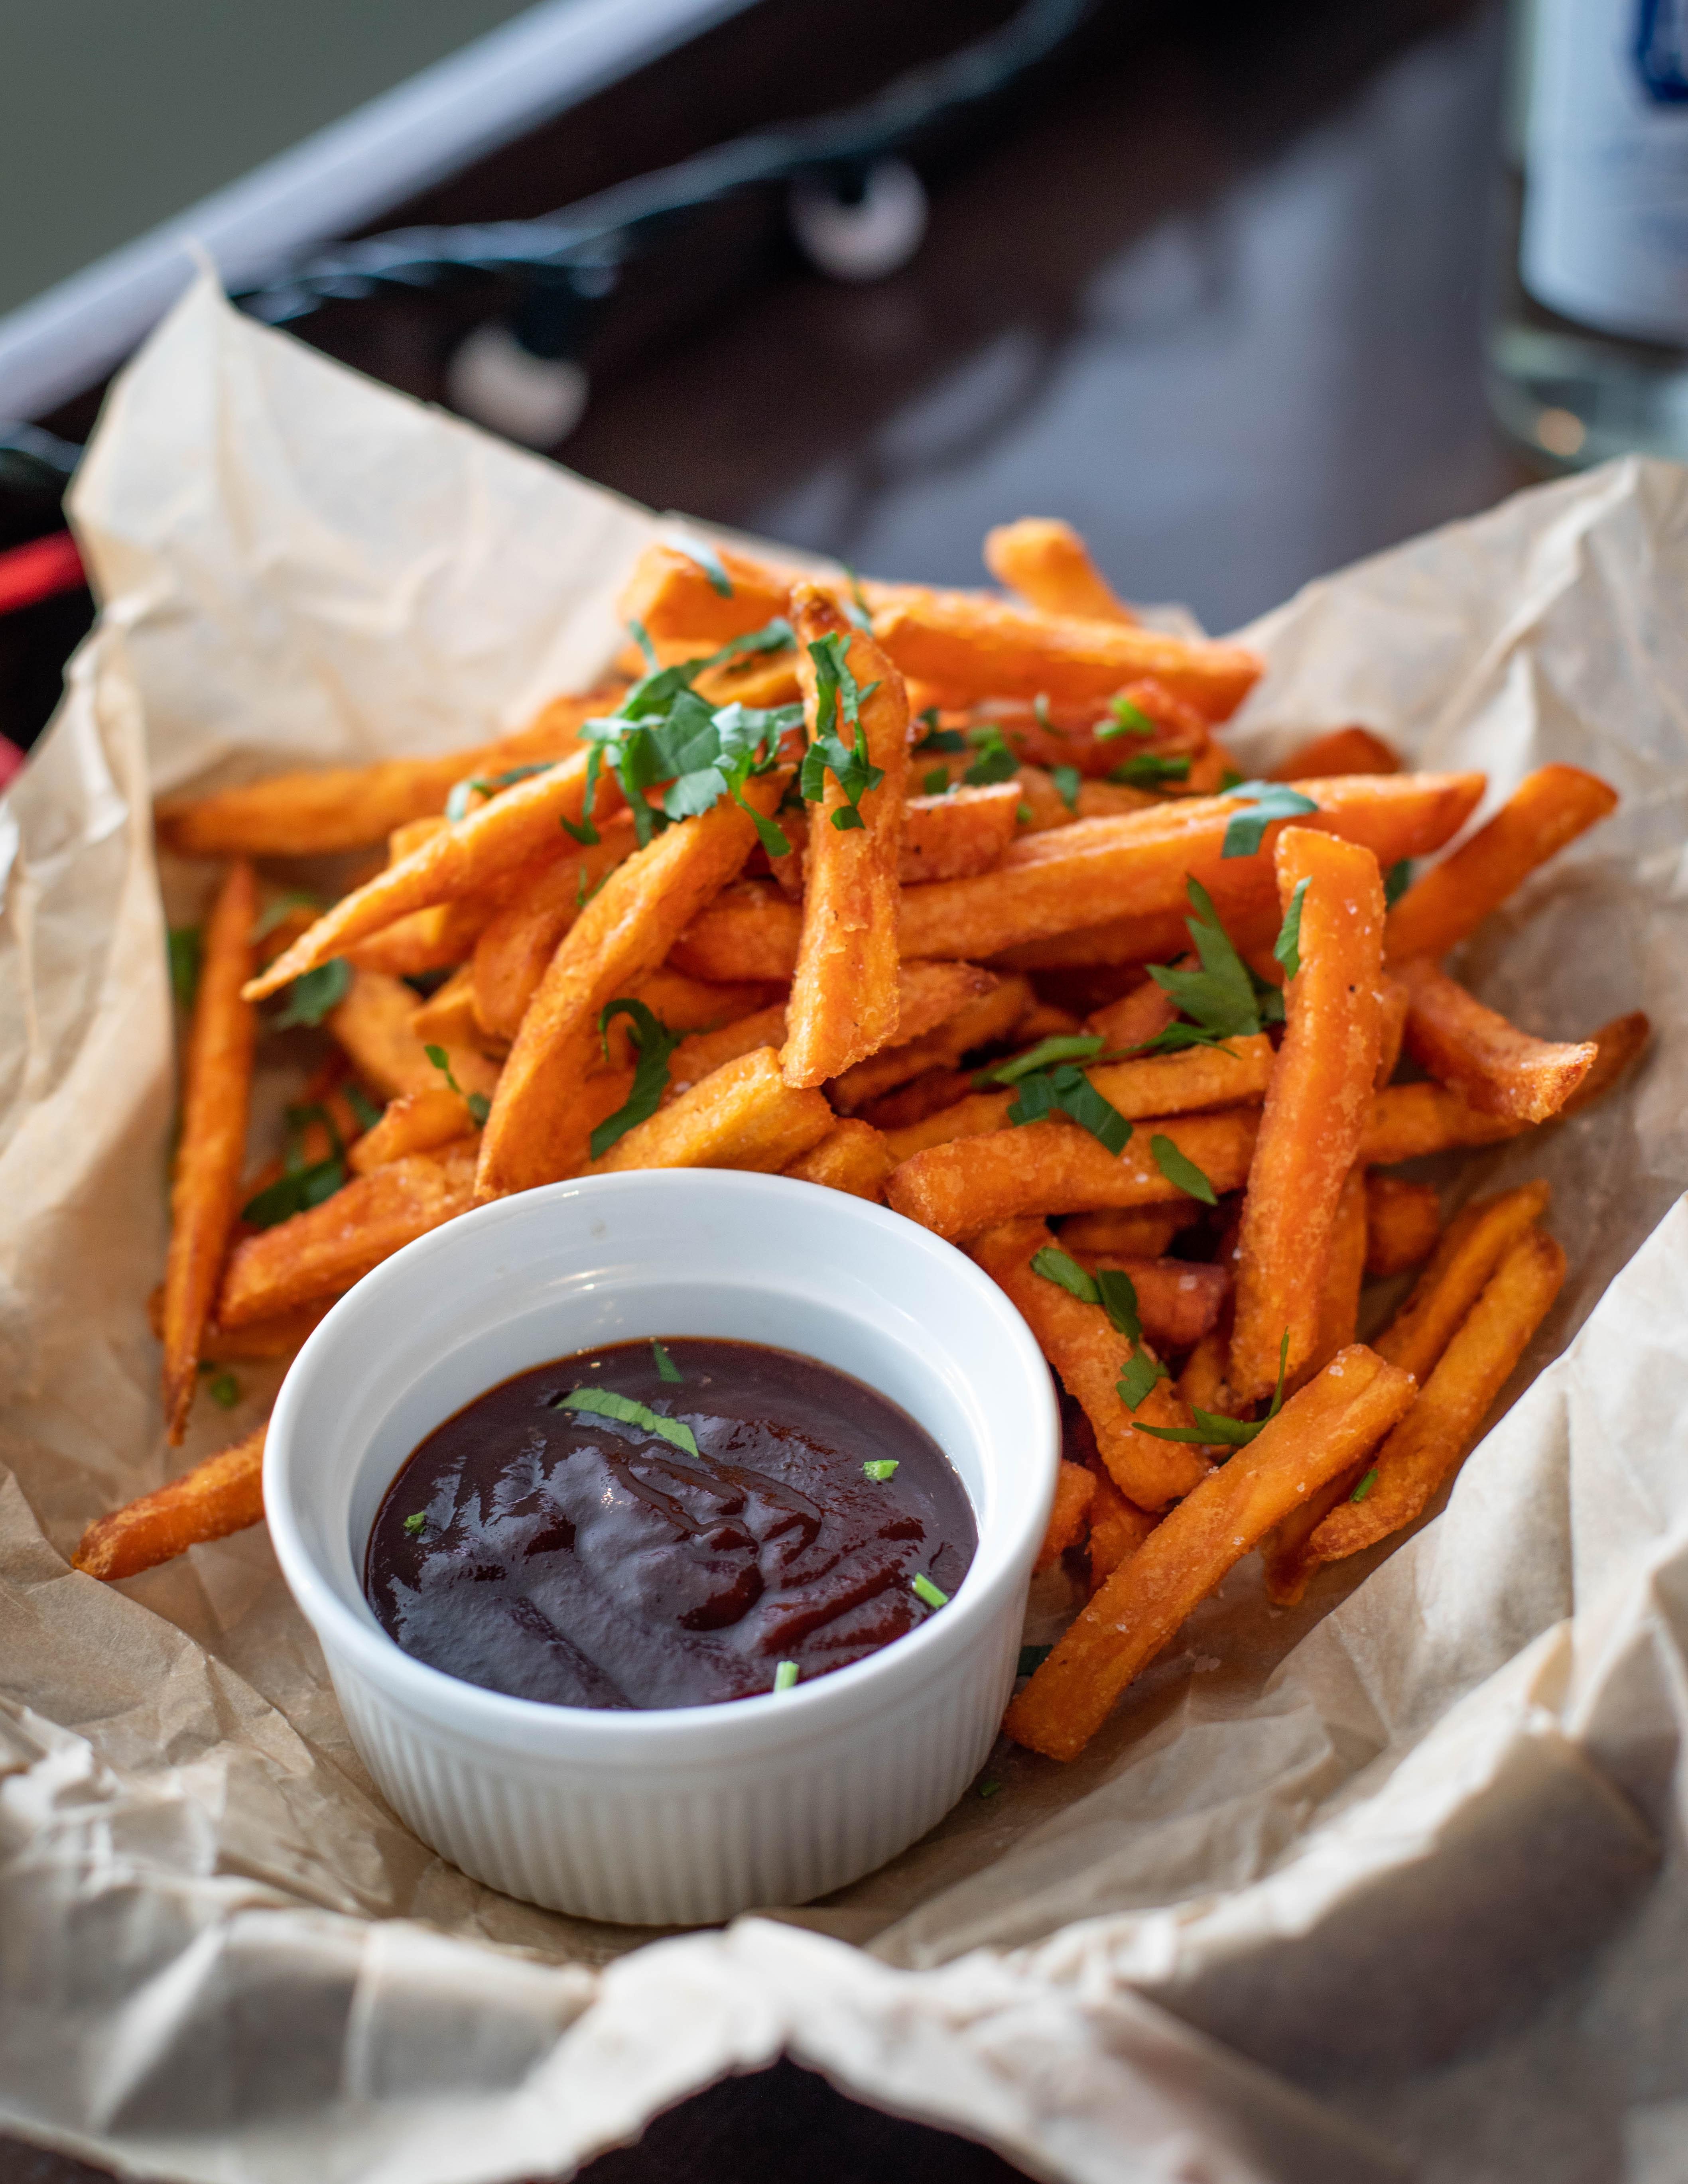 Sweet potato chips.  https://www.wocdetox.com/body-detox-facts.html